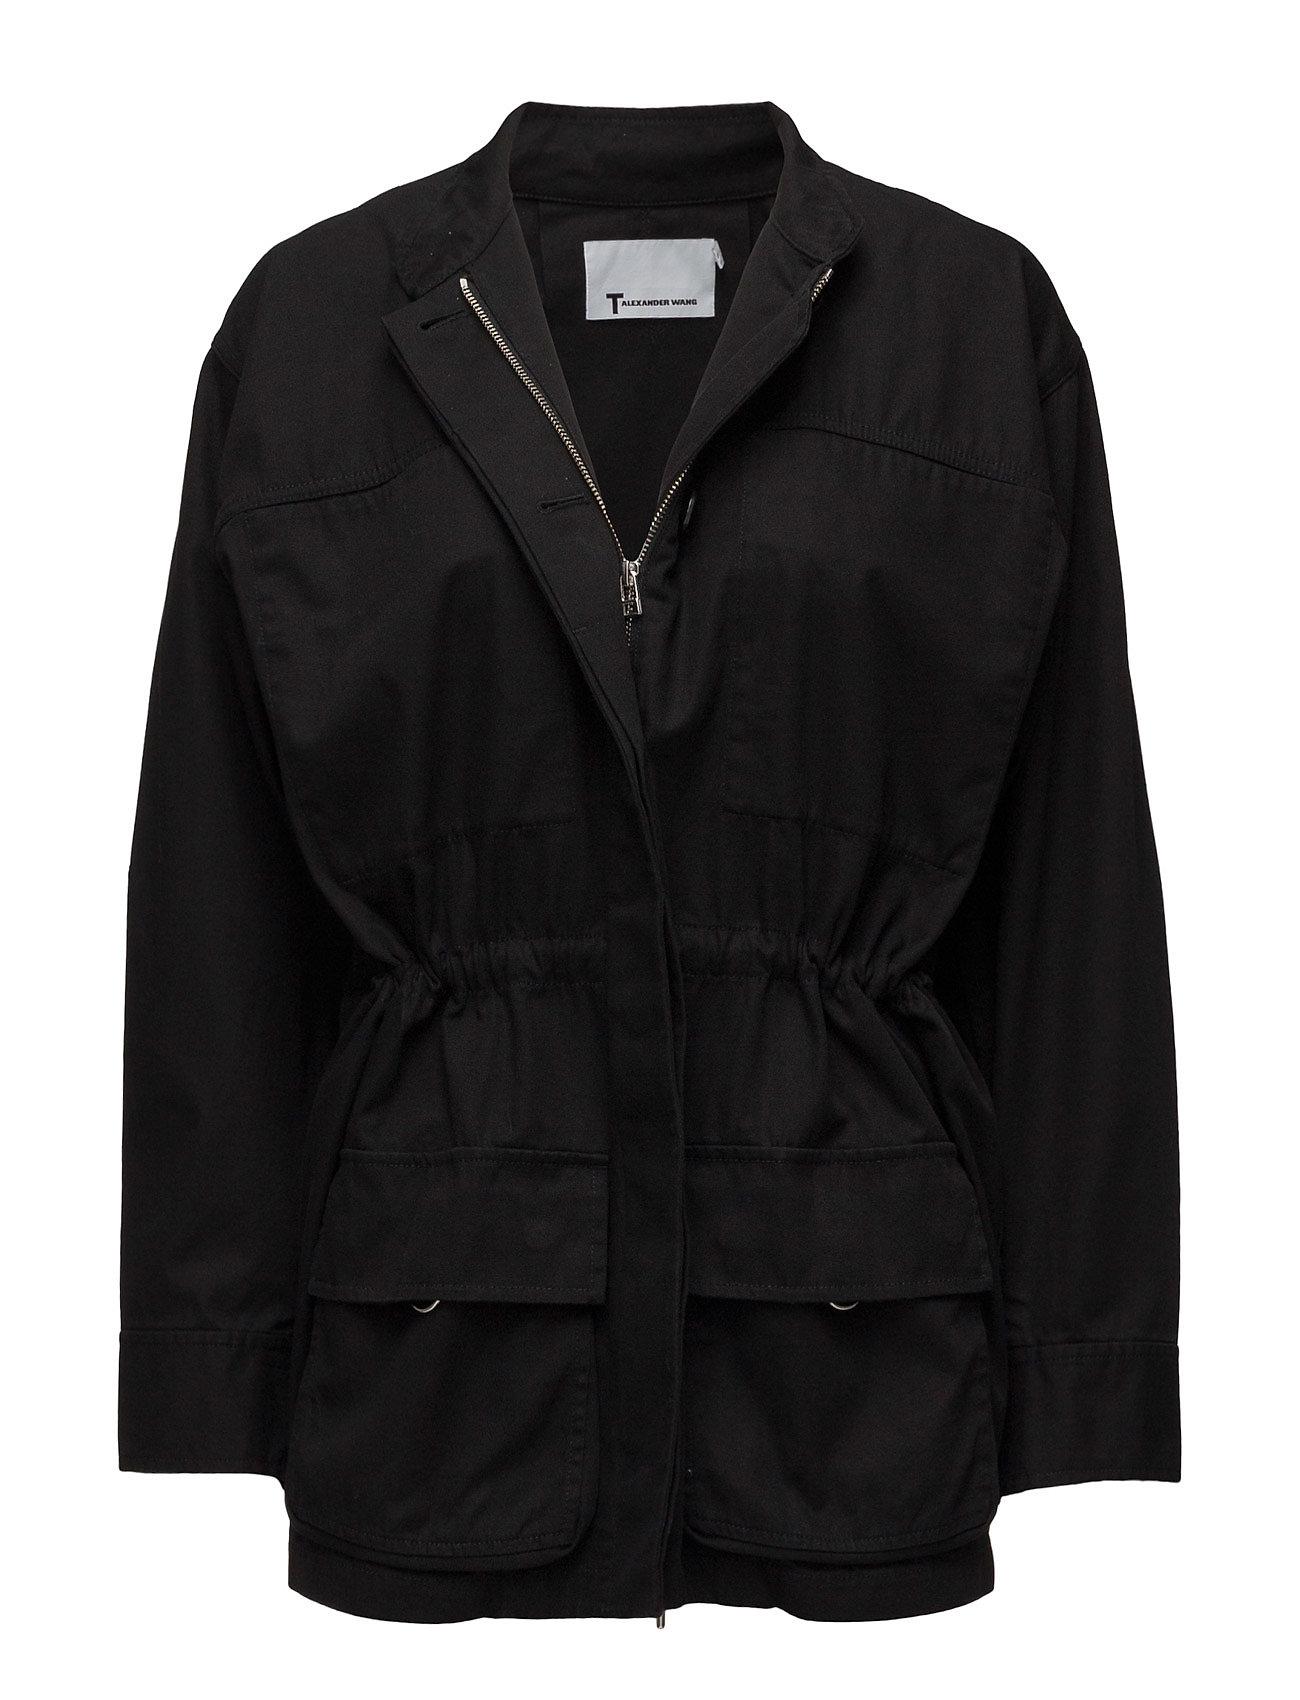 t by alexander wang – L/s coat w/ drawcord på boozt.com dk